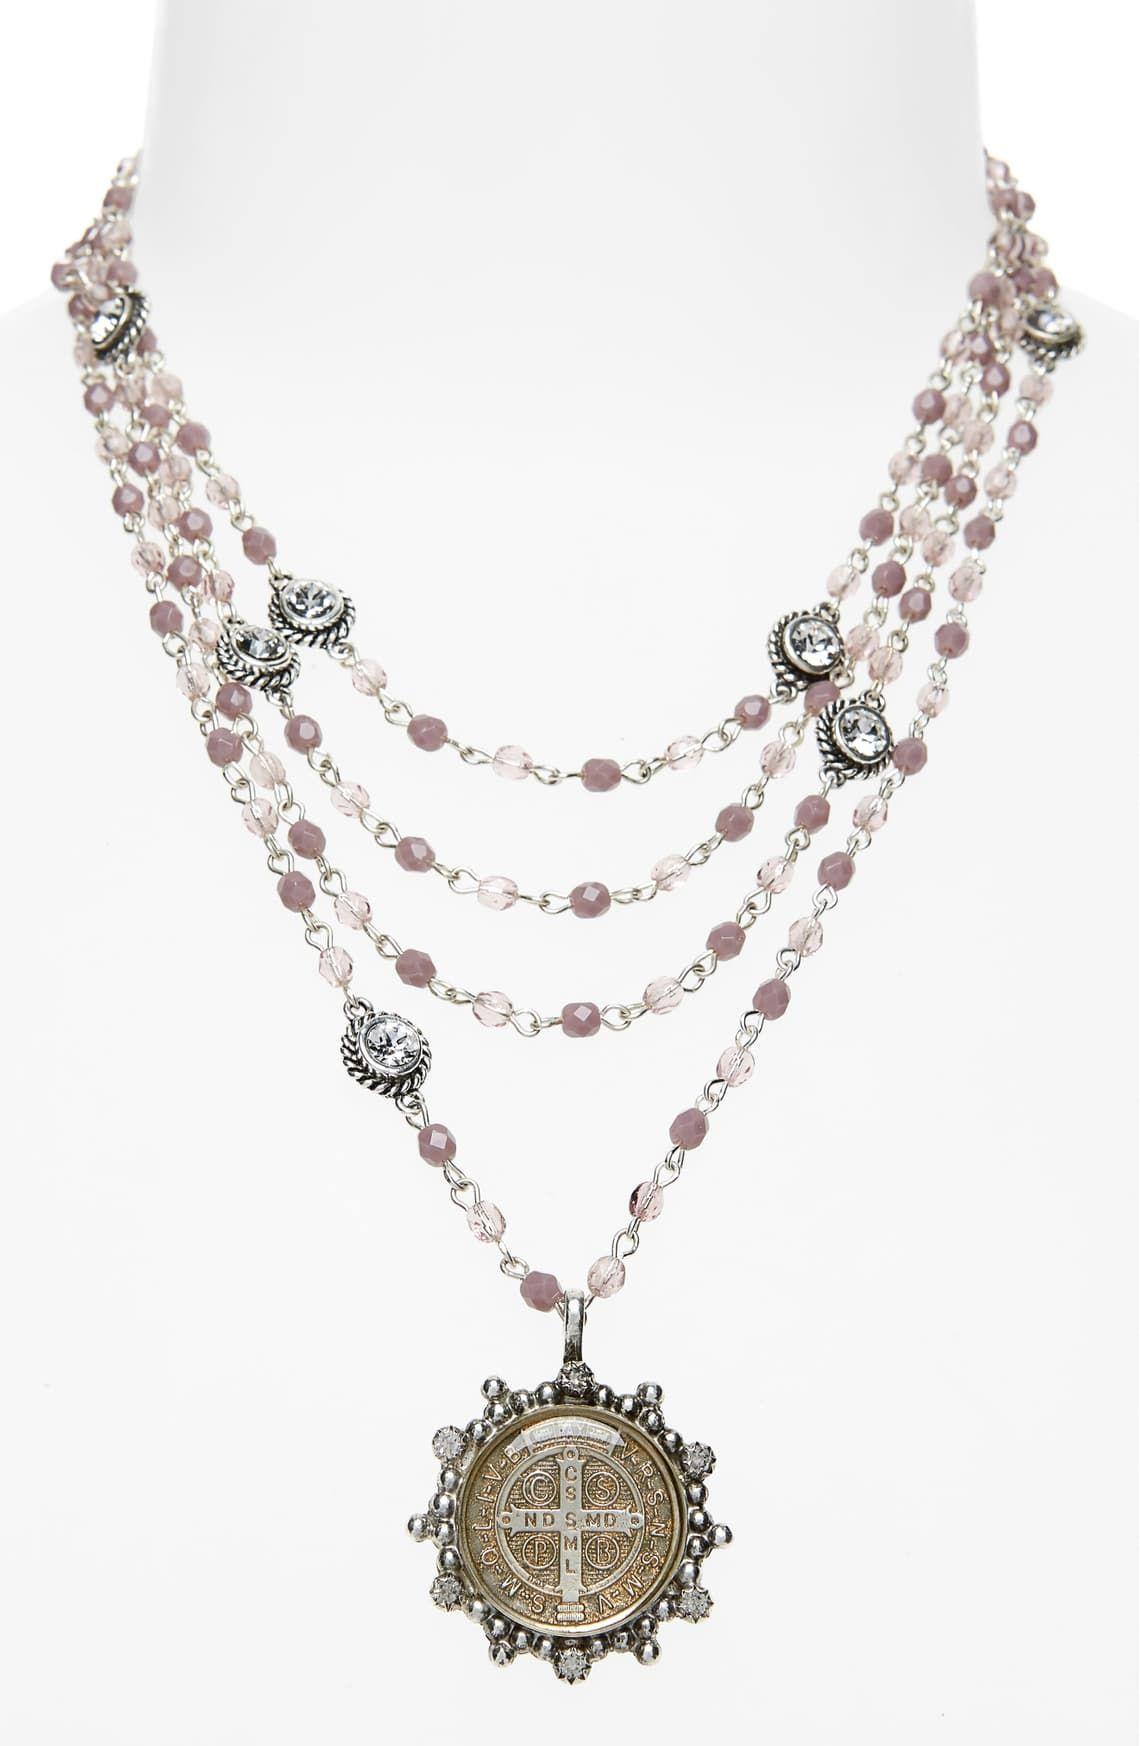 Virgins Saints & Angels San Benito Magdalena Rosary Necklace | Nordstrom